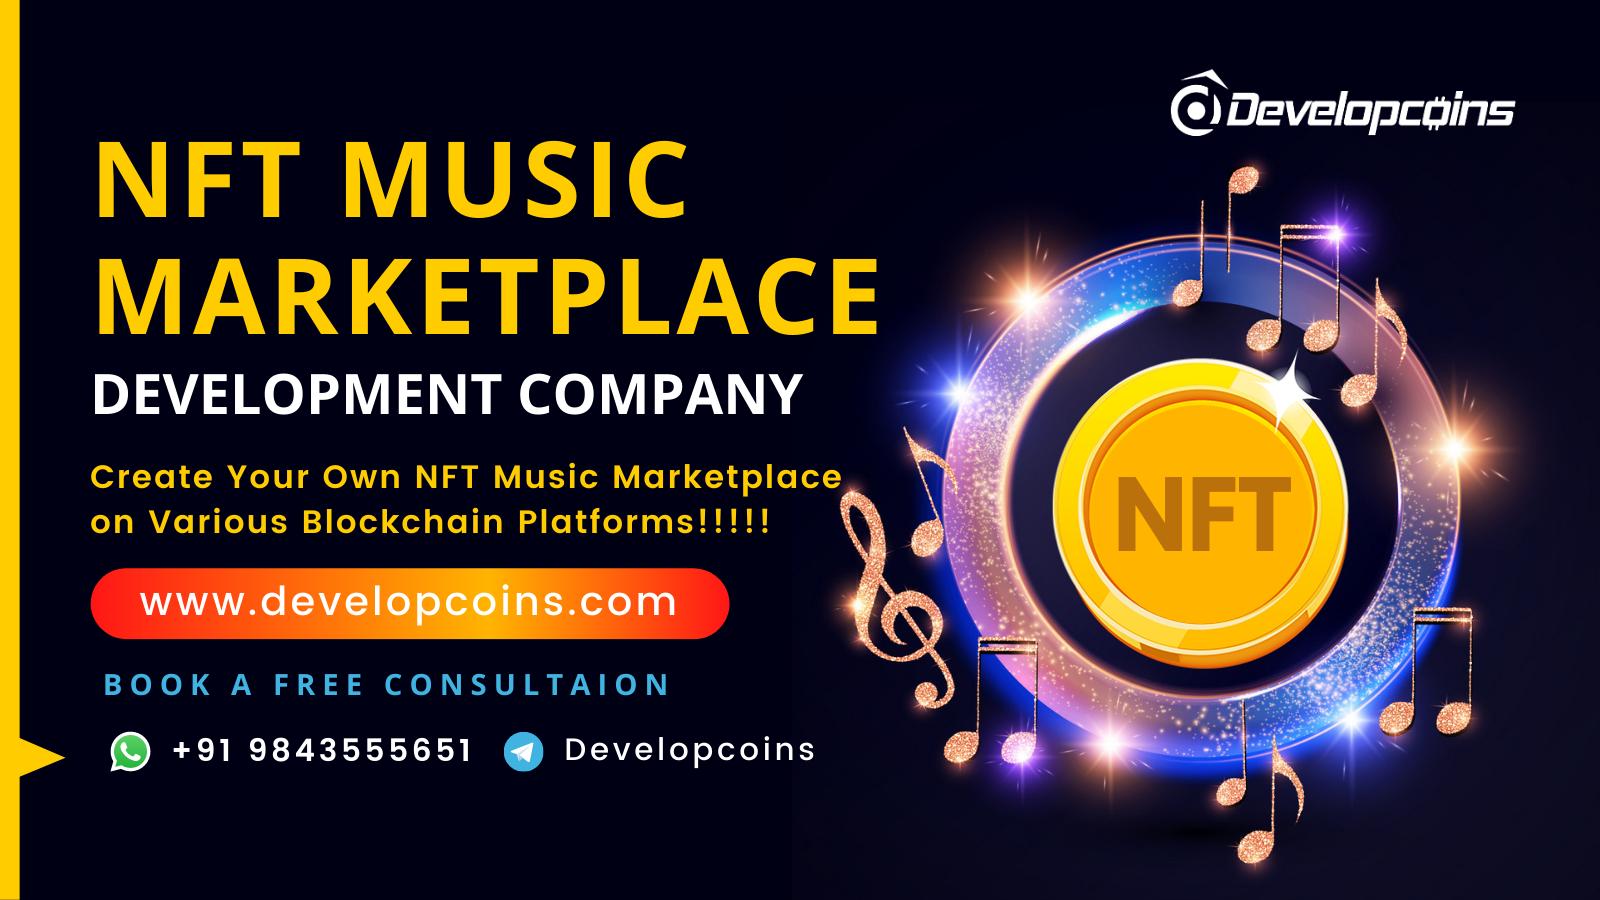 NFT Music Marketplace Development Company